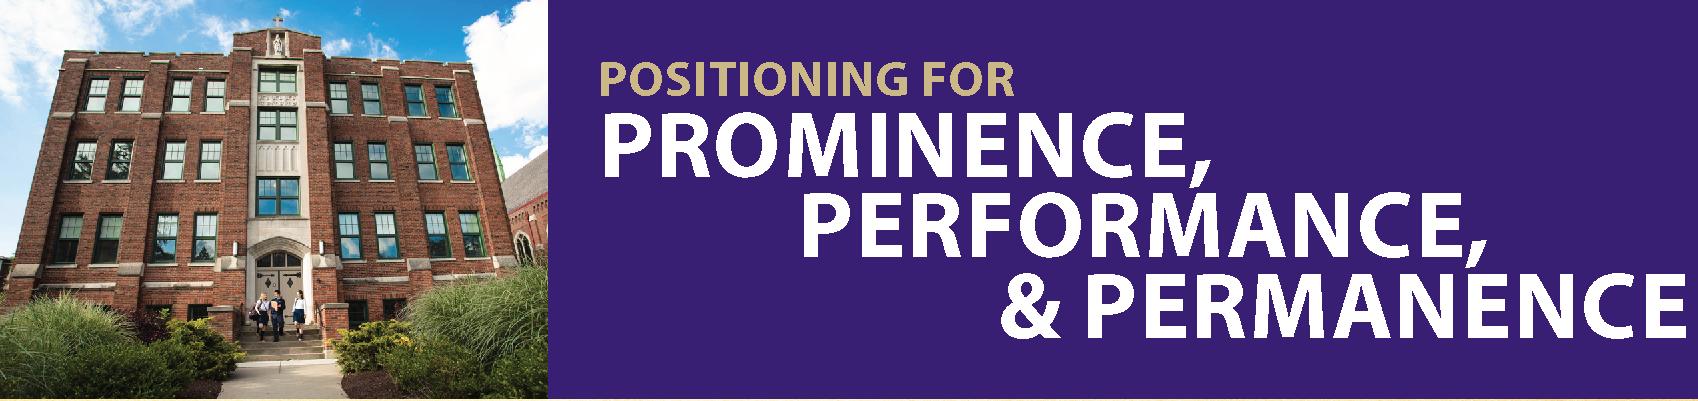 Positioning for Prominence, Performance, & Permanence: OLSH Strategic Plan